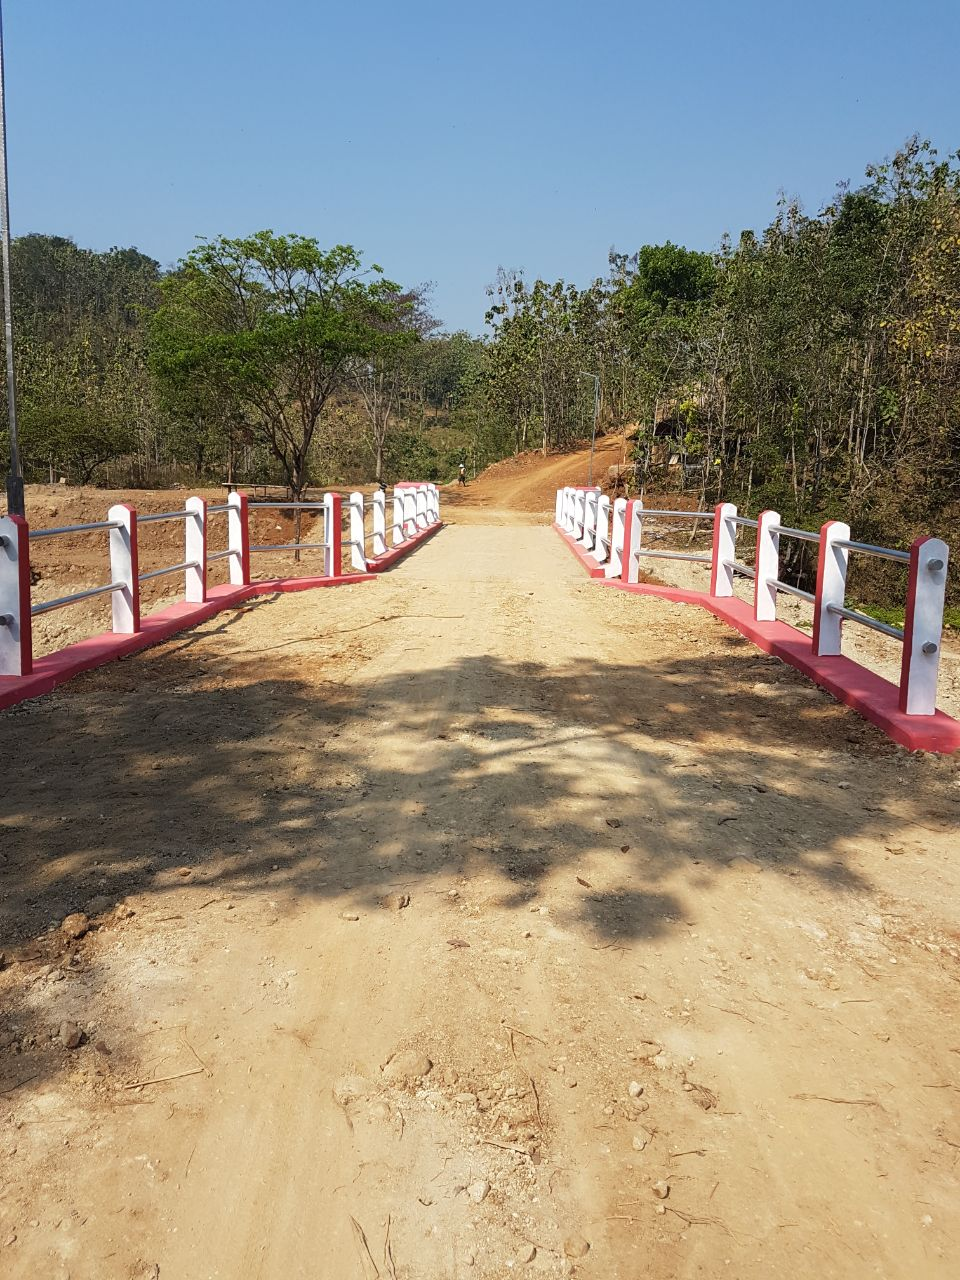 jasa konstruksi baja jembatan daerah jawatengah